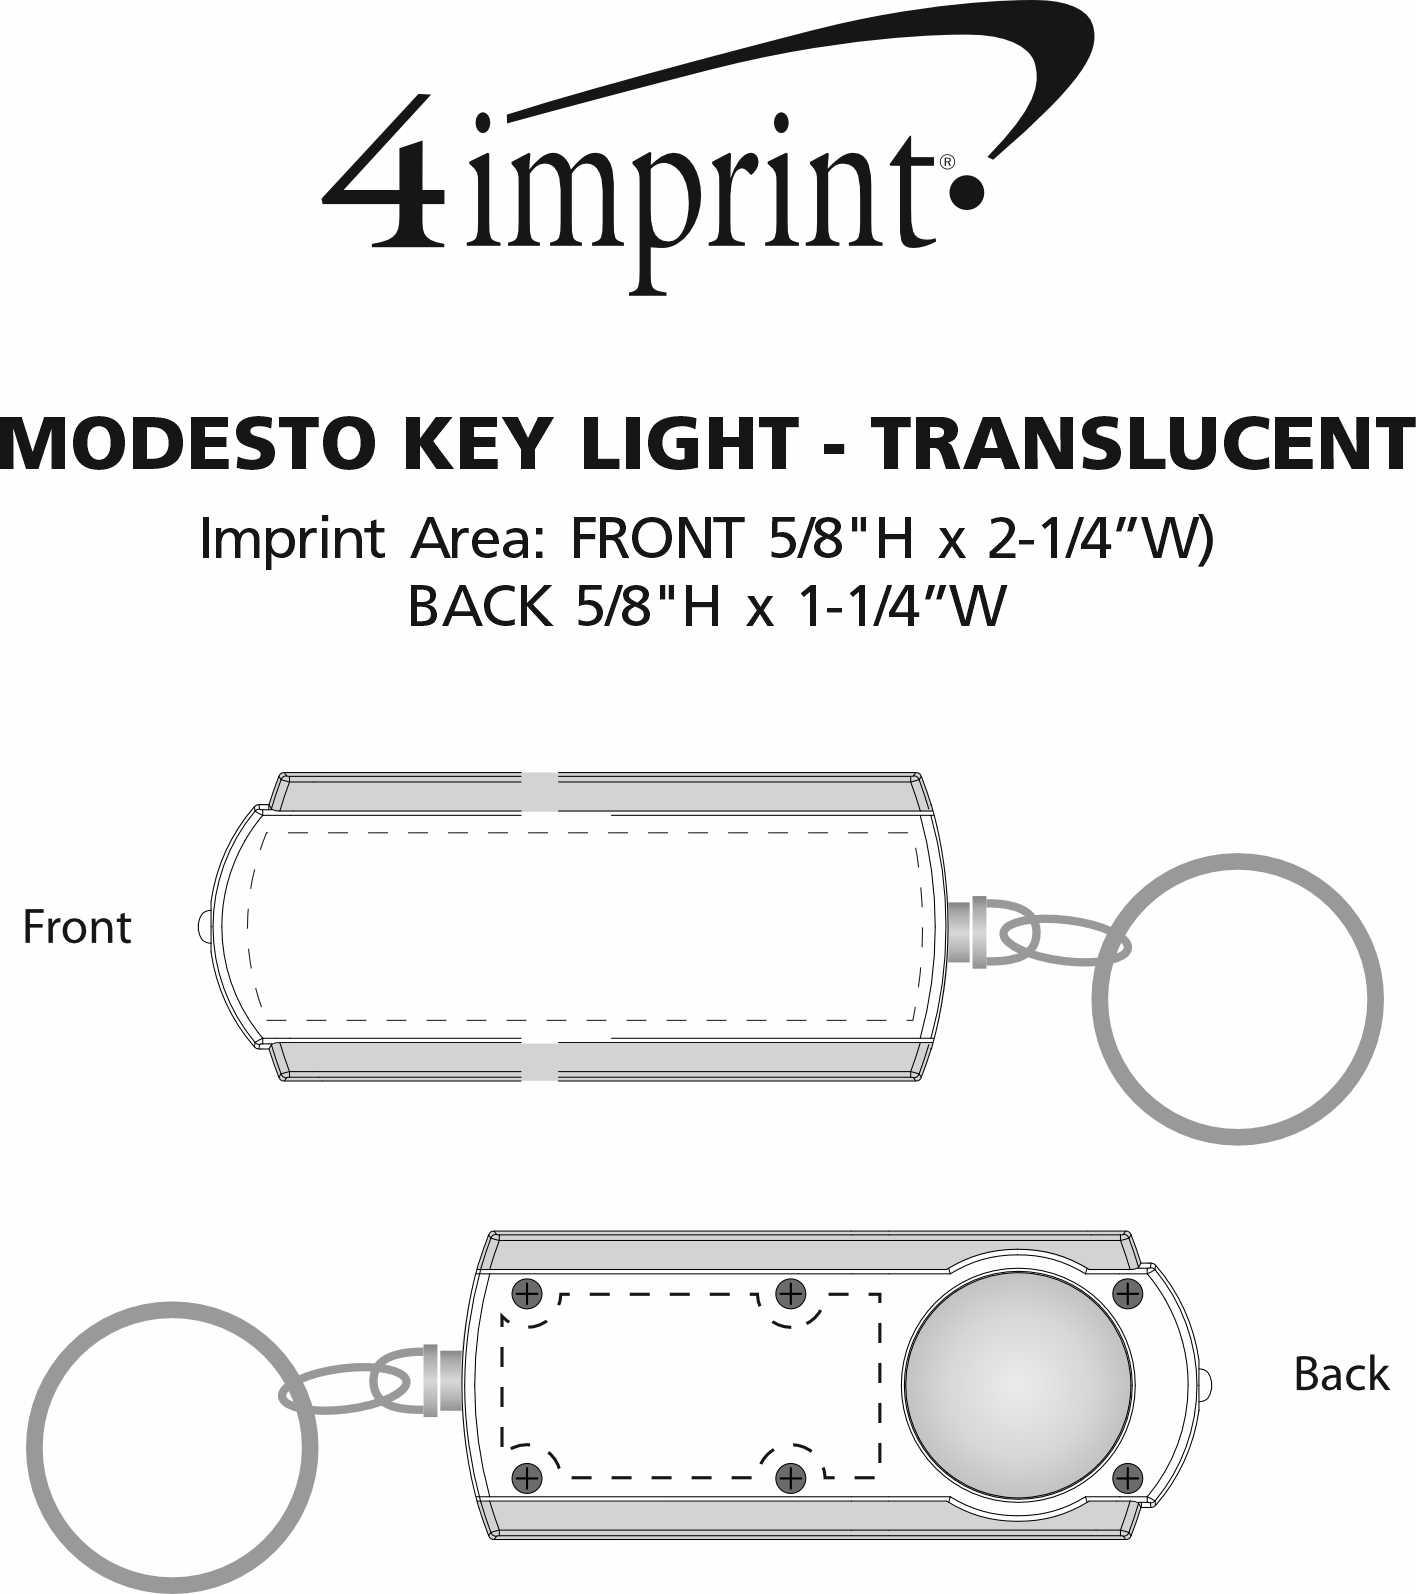 Imprint Area of Modesto Key Light - Translucent